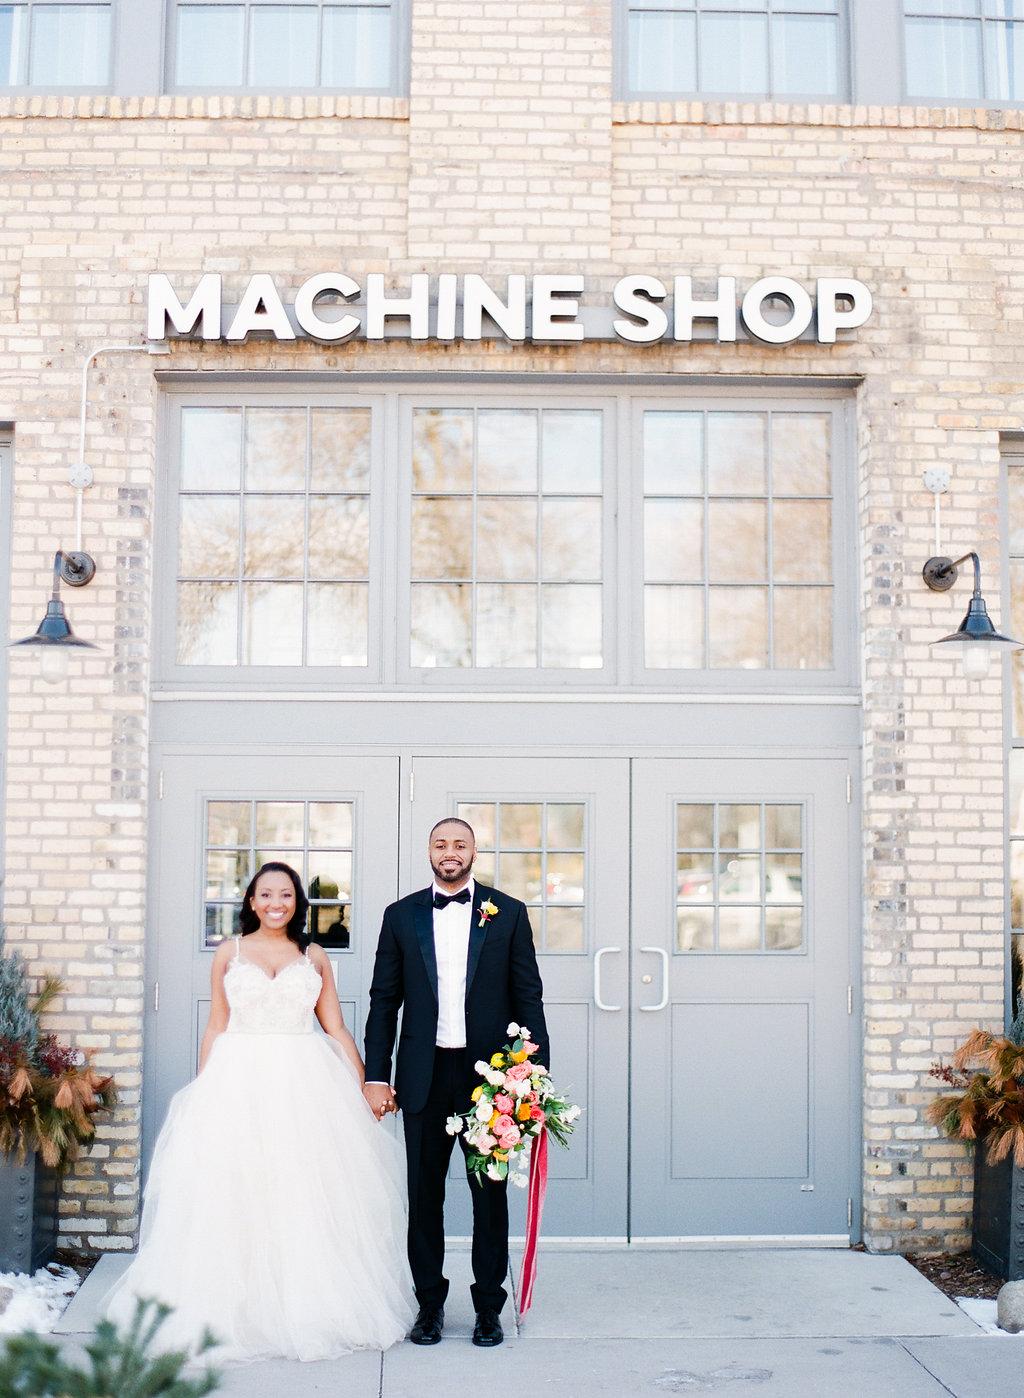 Machine Shop Styled Shoot